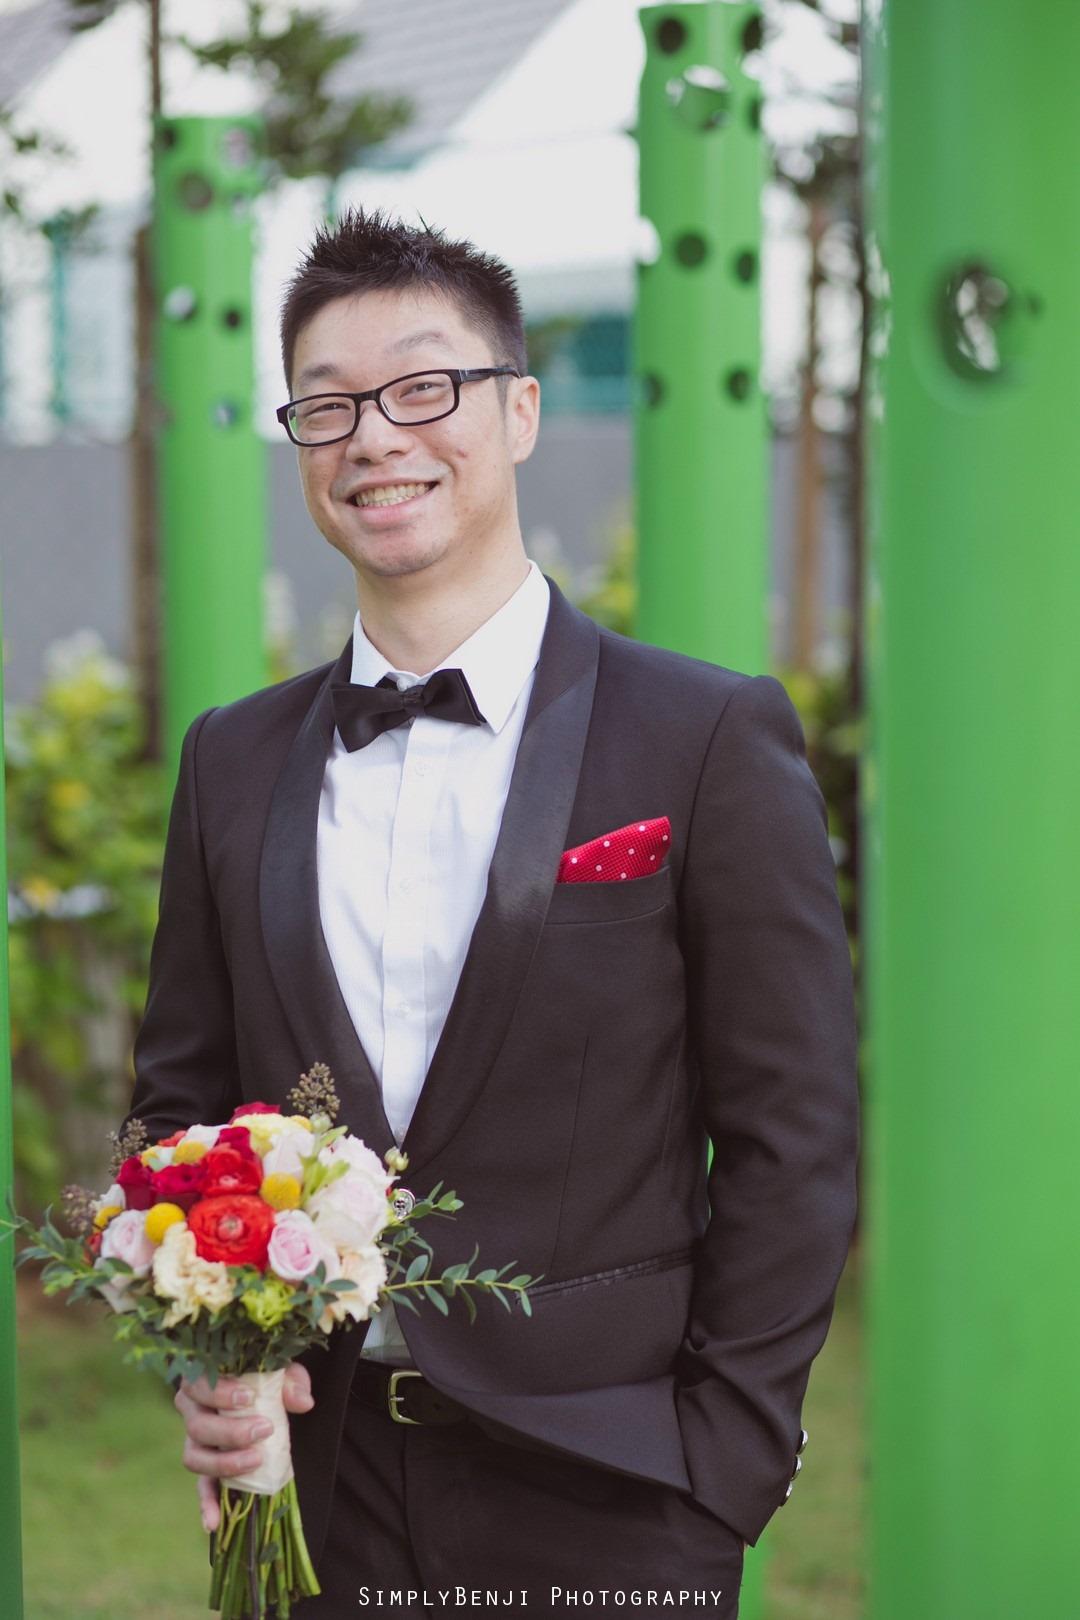 Chinese Wedding Gate Crashing at KM1 East Condominium & Wedding Reception at Concorde Hotel Kuala Lumpur_00014